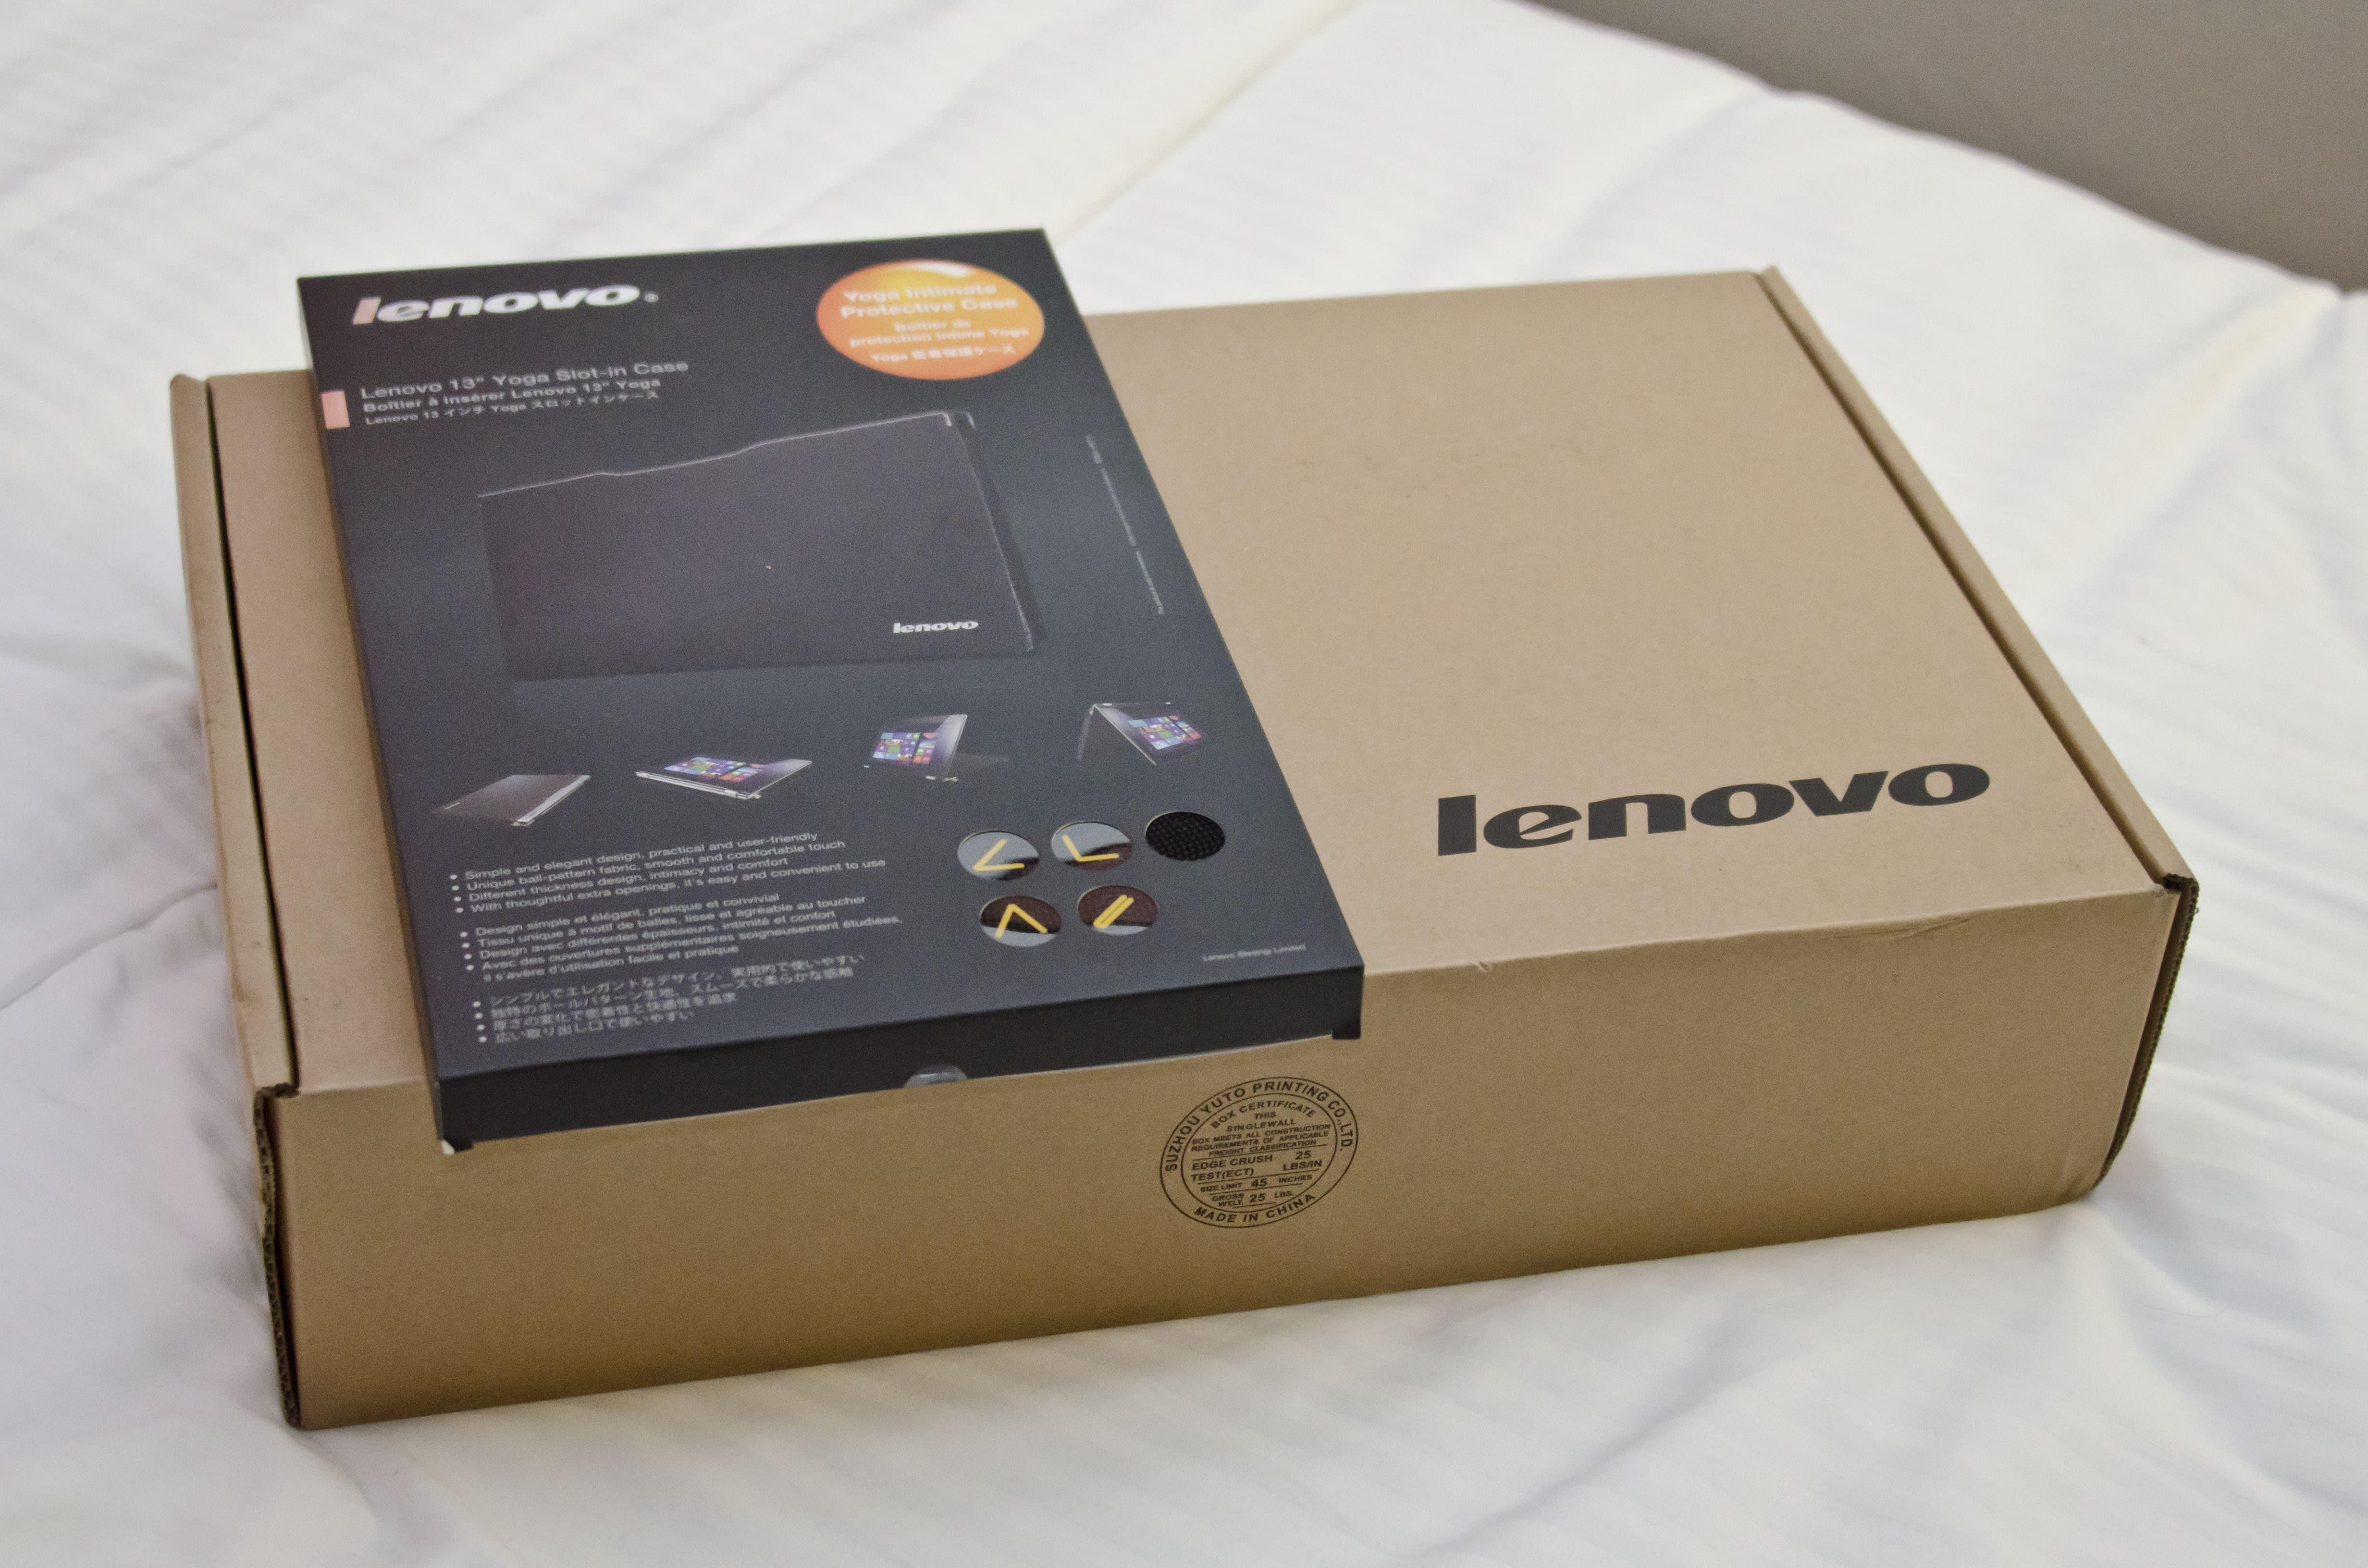 Dsc 9142 Raw Lenovo Yoga 13 Photos Unboxing Dsc 9142 Raw Lenovo Yoga 13 Photos Unboxing